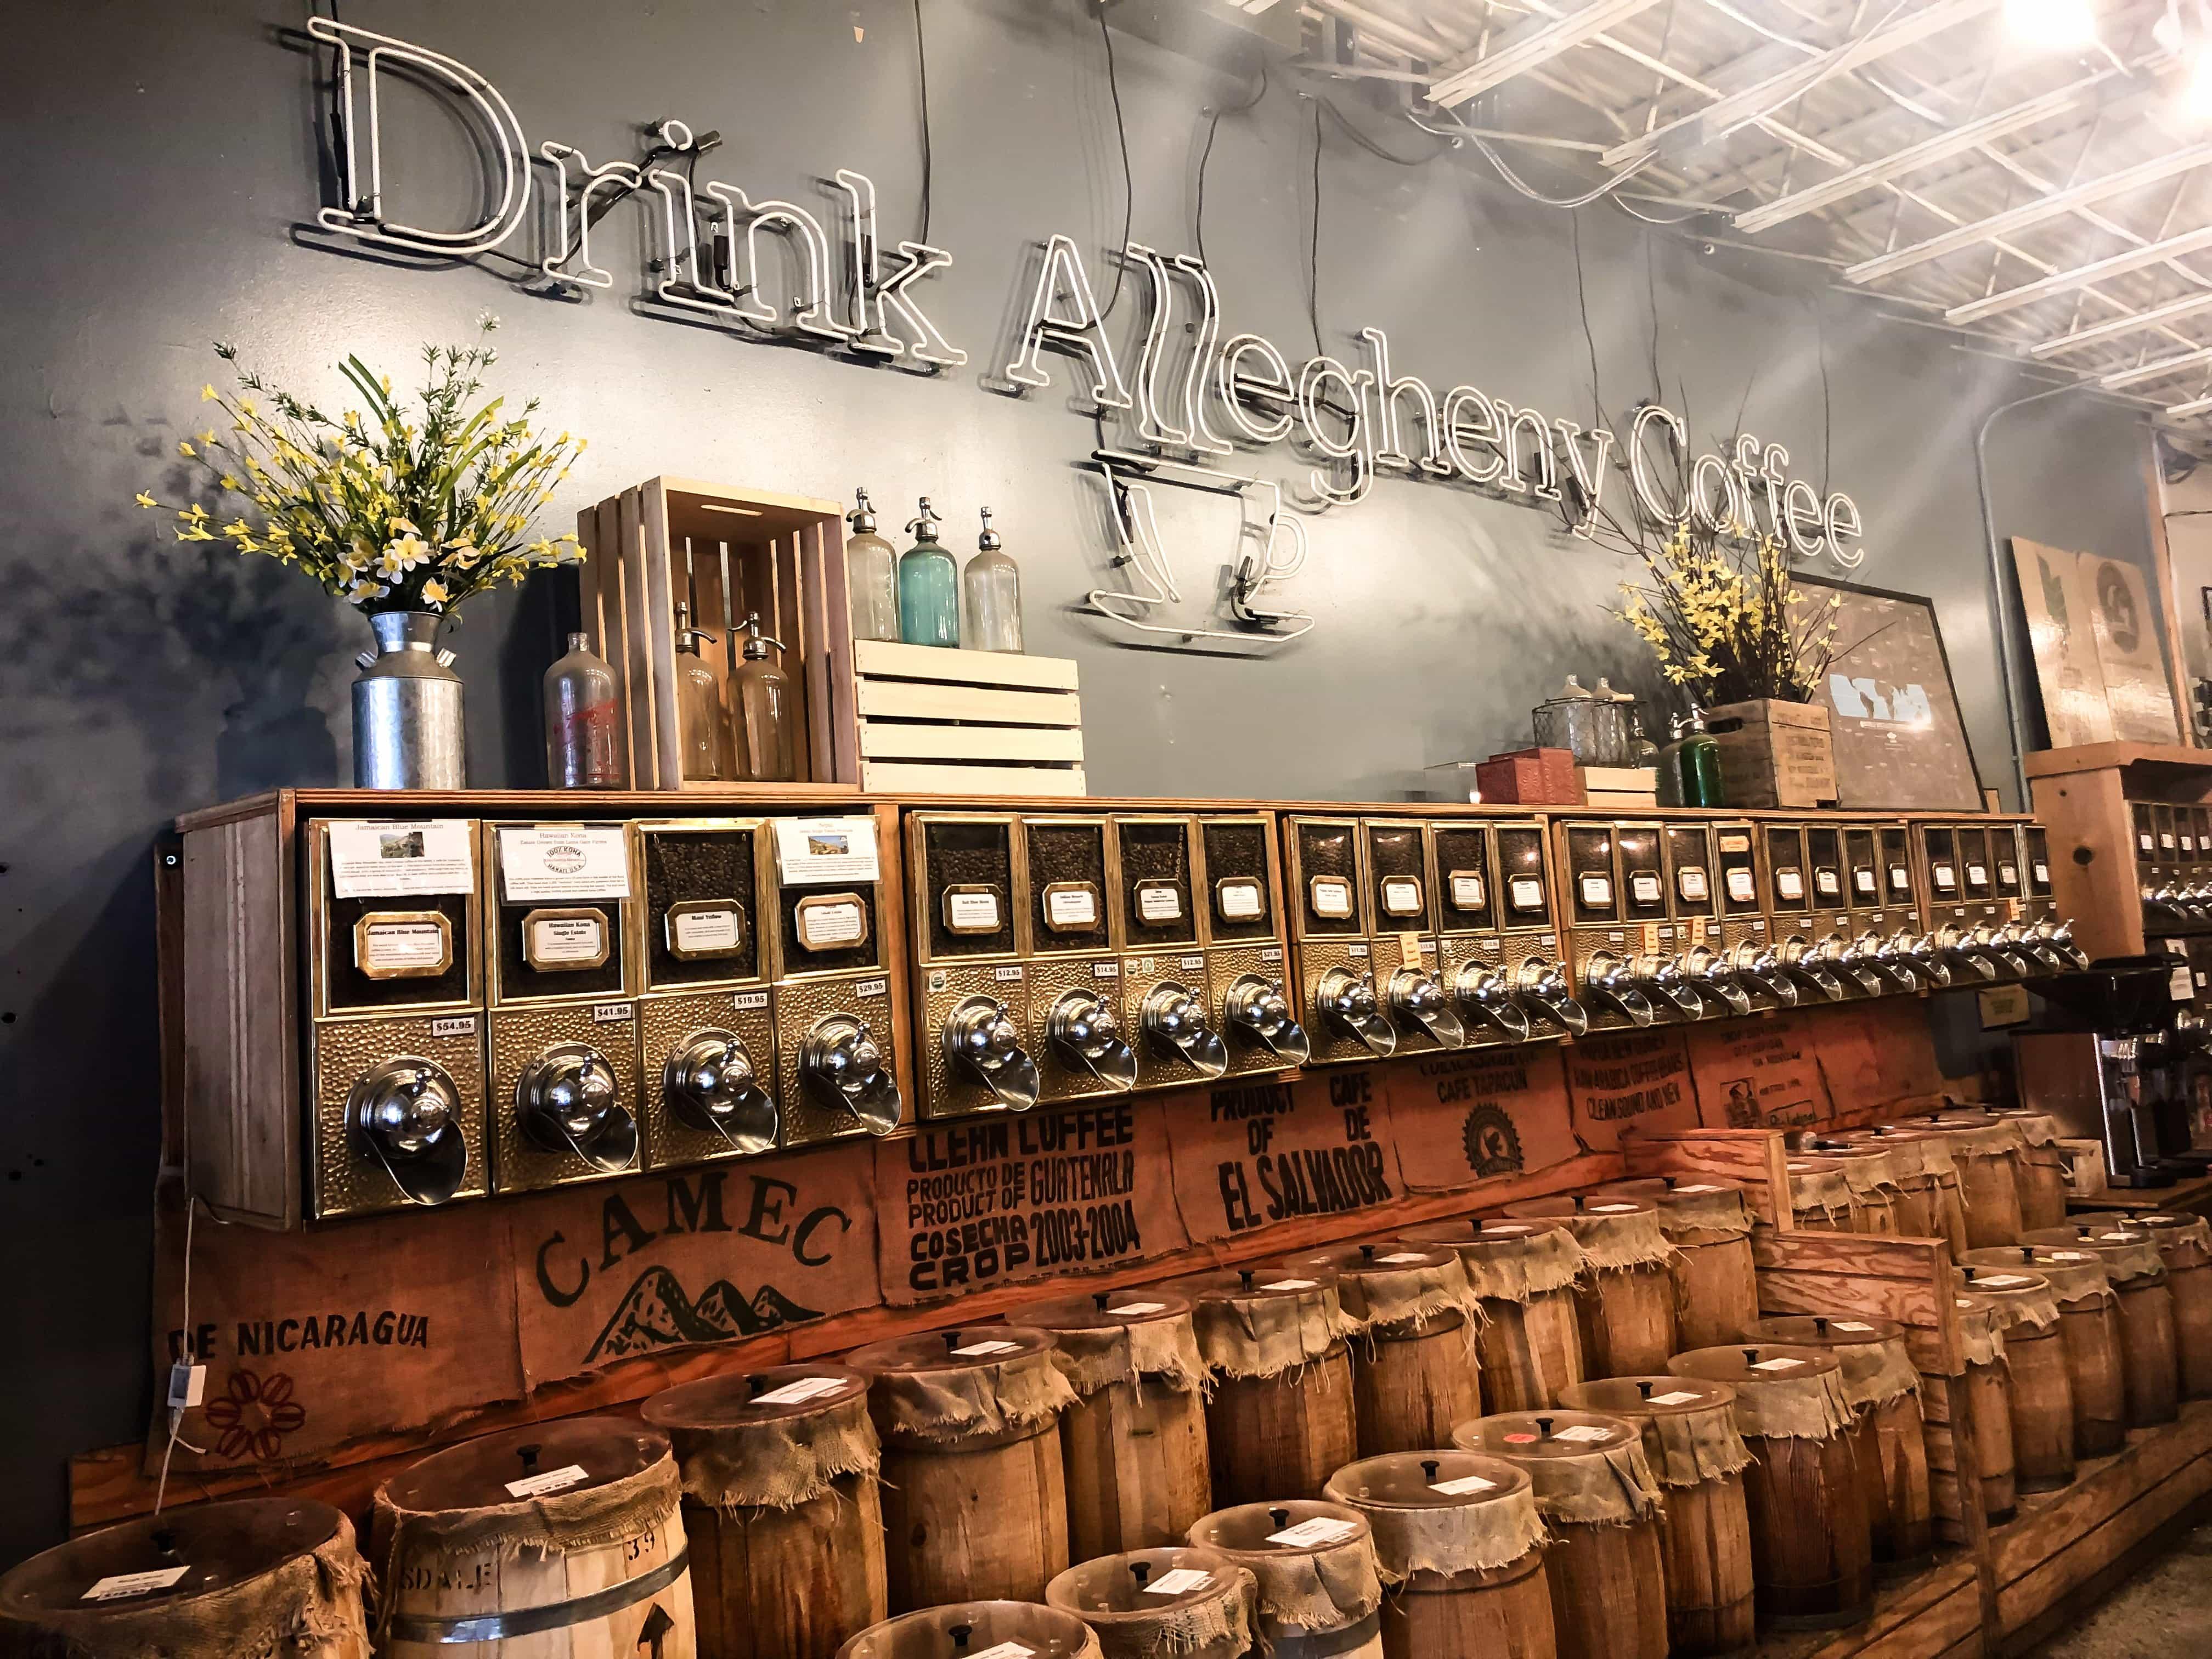 Allegheny Coffee